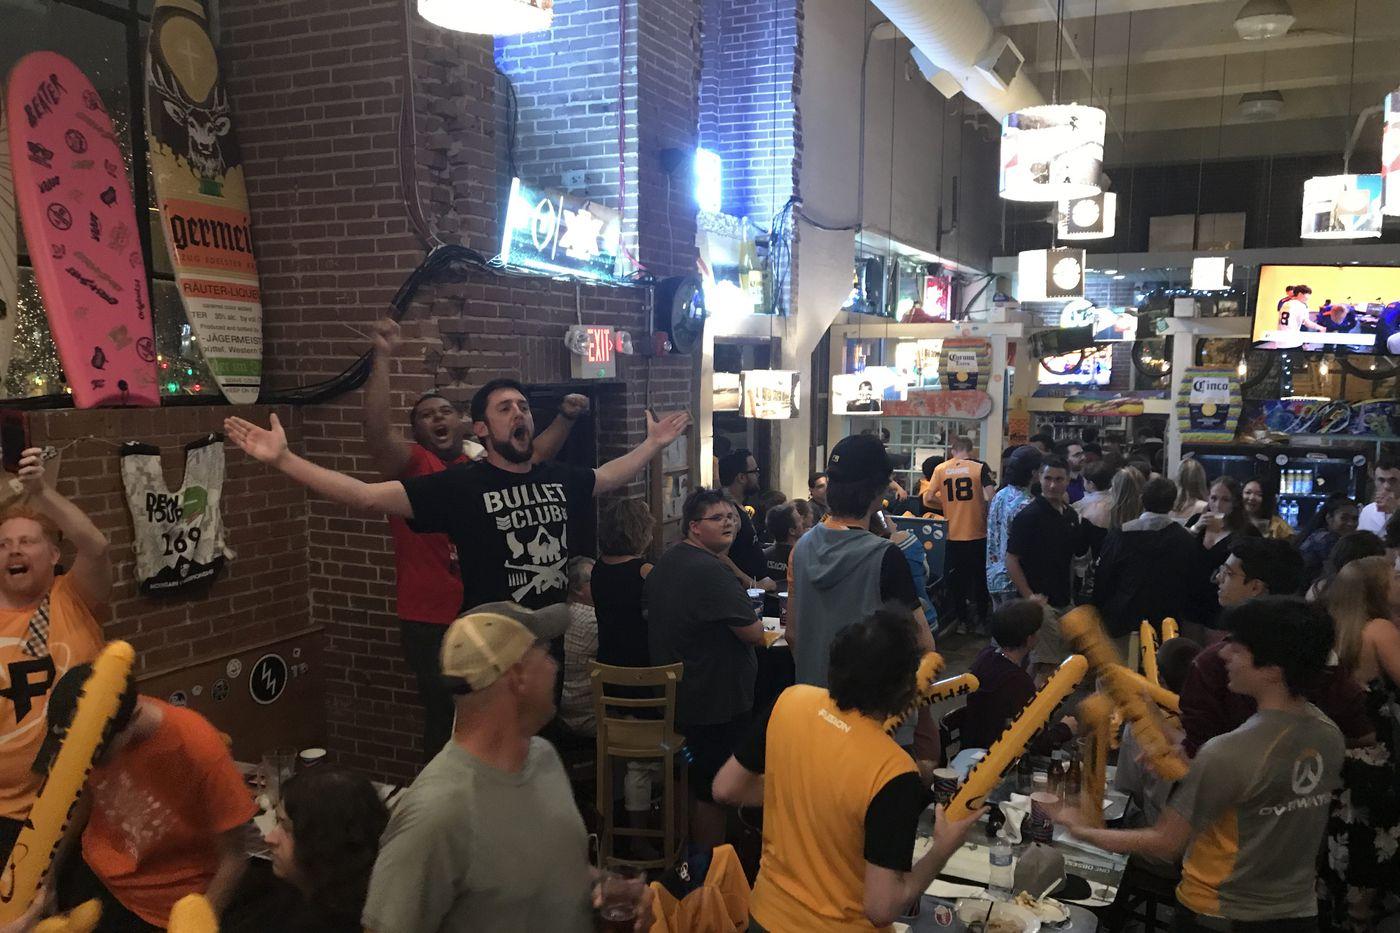 Underdog Philadelphia Fusion advance to inaugural championship of e-sports Overwatch League